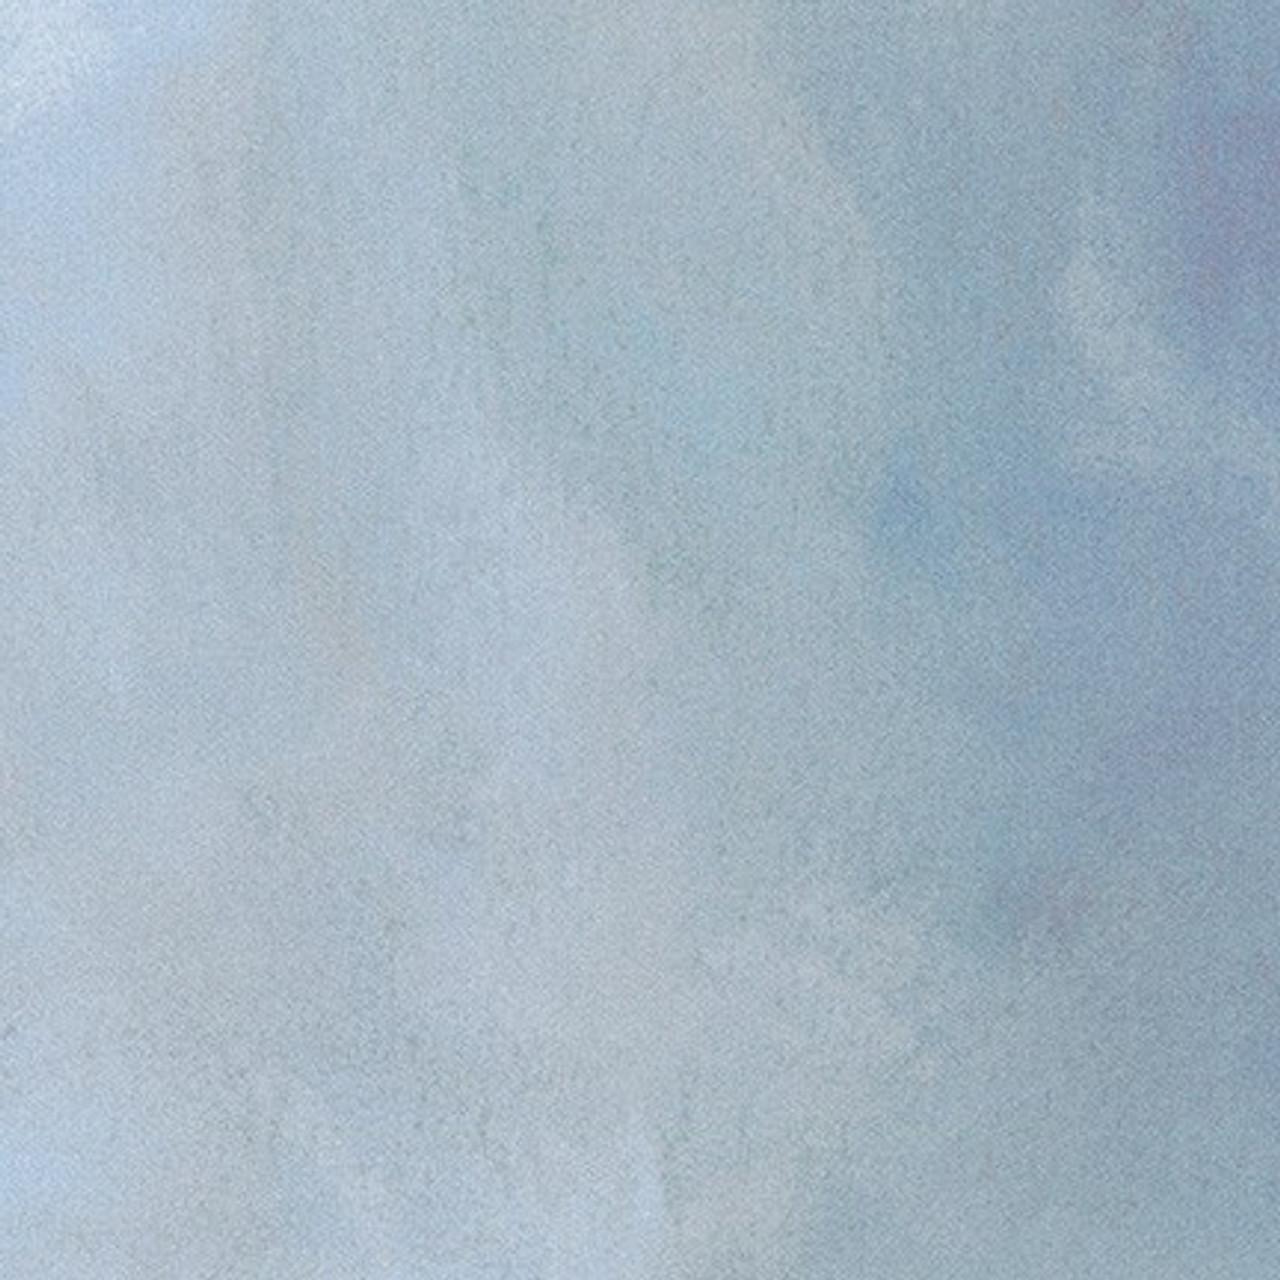 Sky - Mist